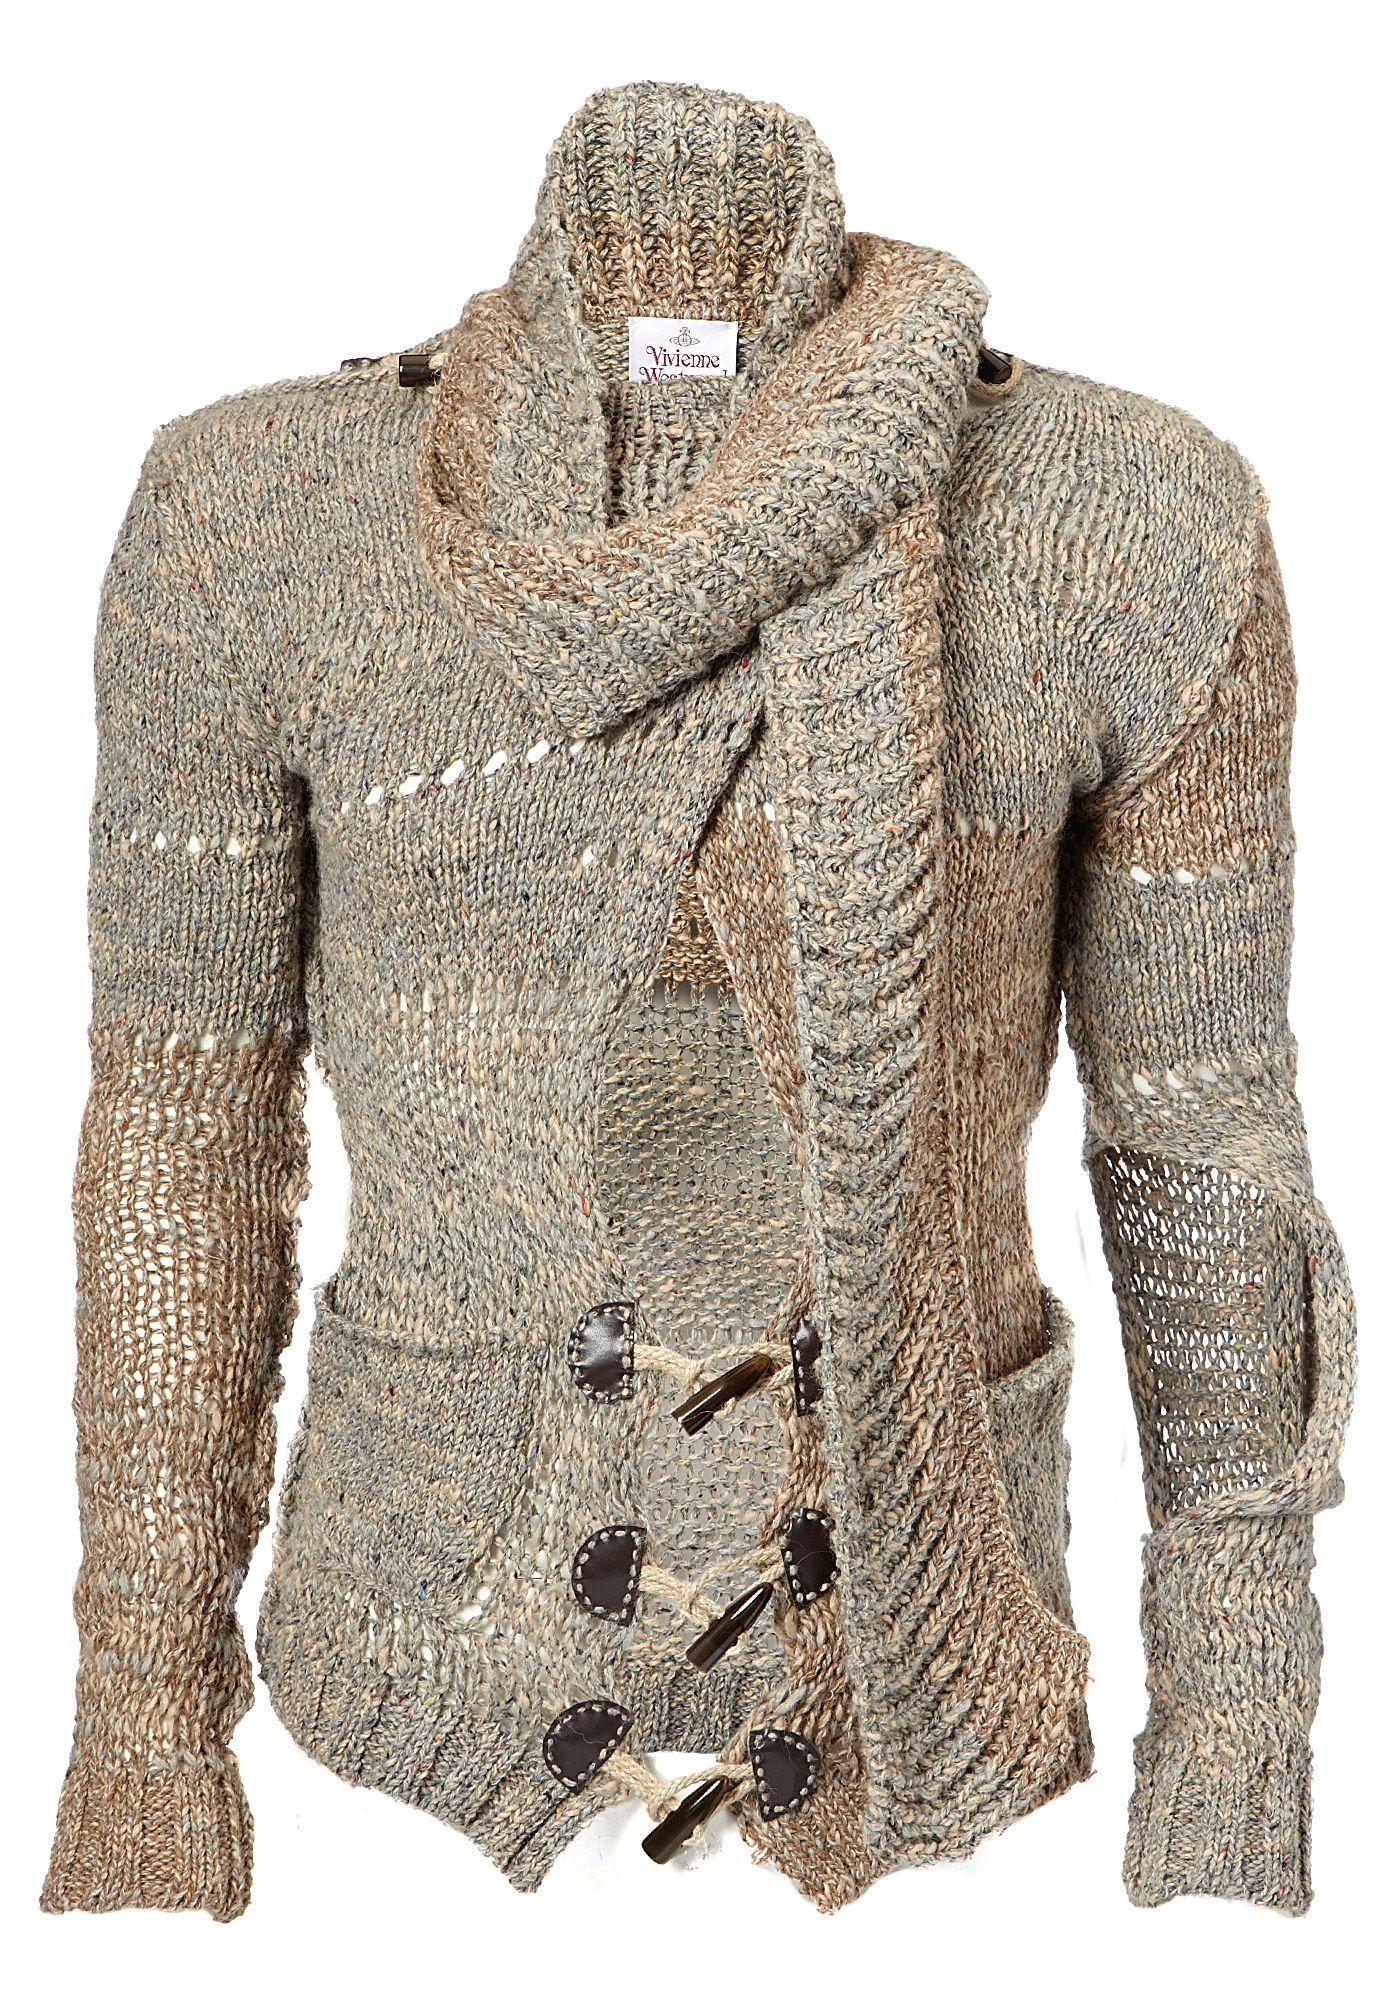 Mc Liroy Cardigan Vivienne Westwood - $990